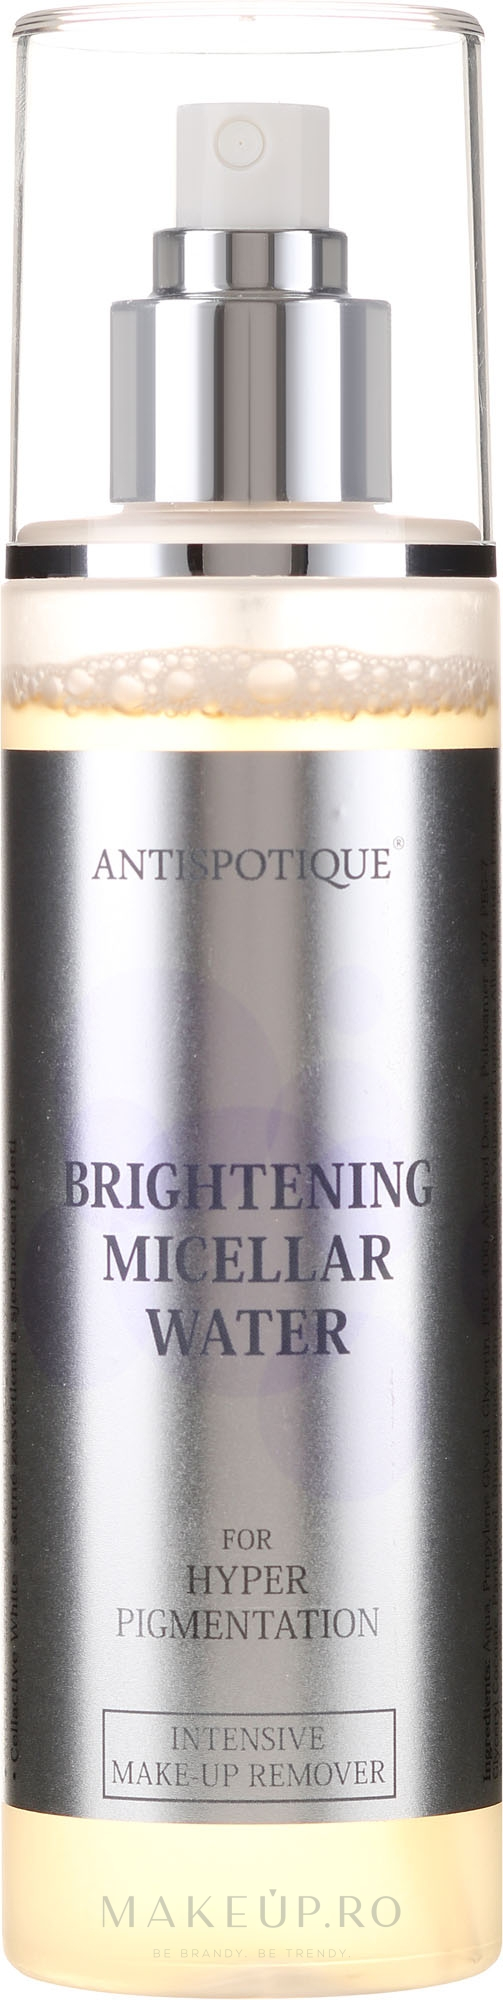 Apă micelară - Antispotique Brightening Micellar Water — Imagine 200 ml